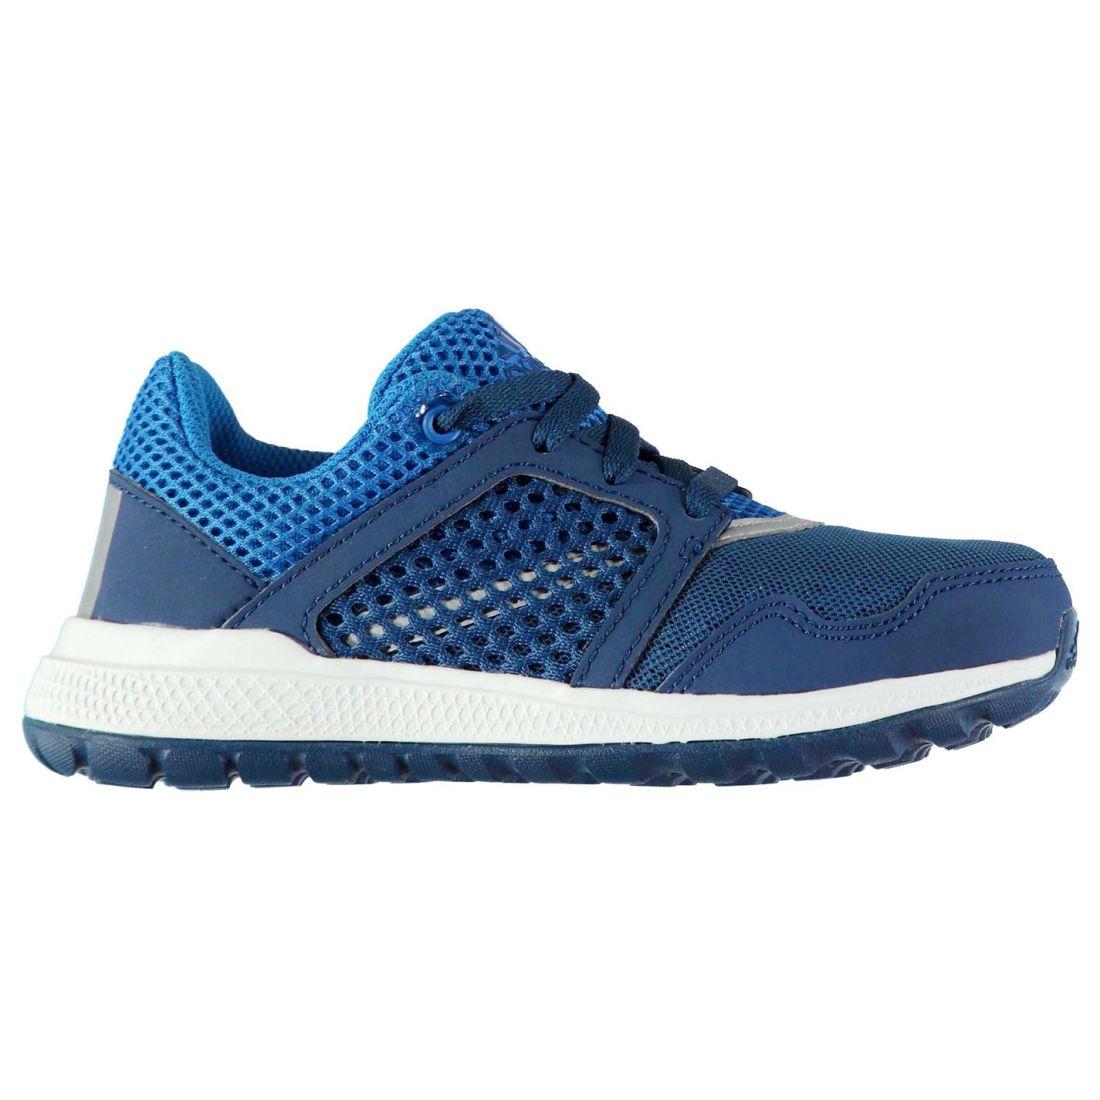 d5e422b068f6 adidas Energy Bounce Sport Activity Shoes Childrens Boys Laces ...